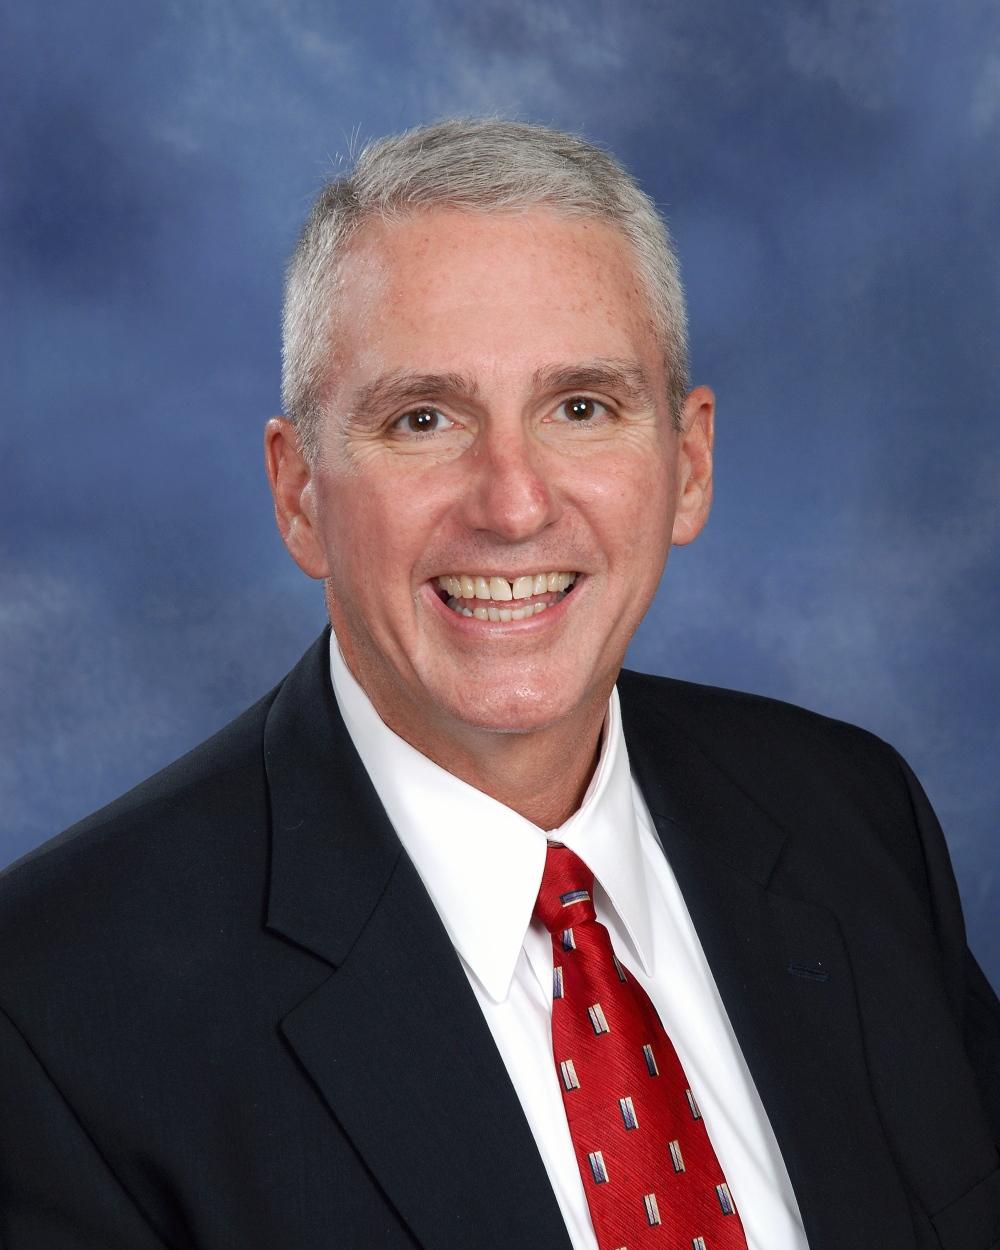 Pastor Brian Bosworth